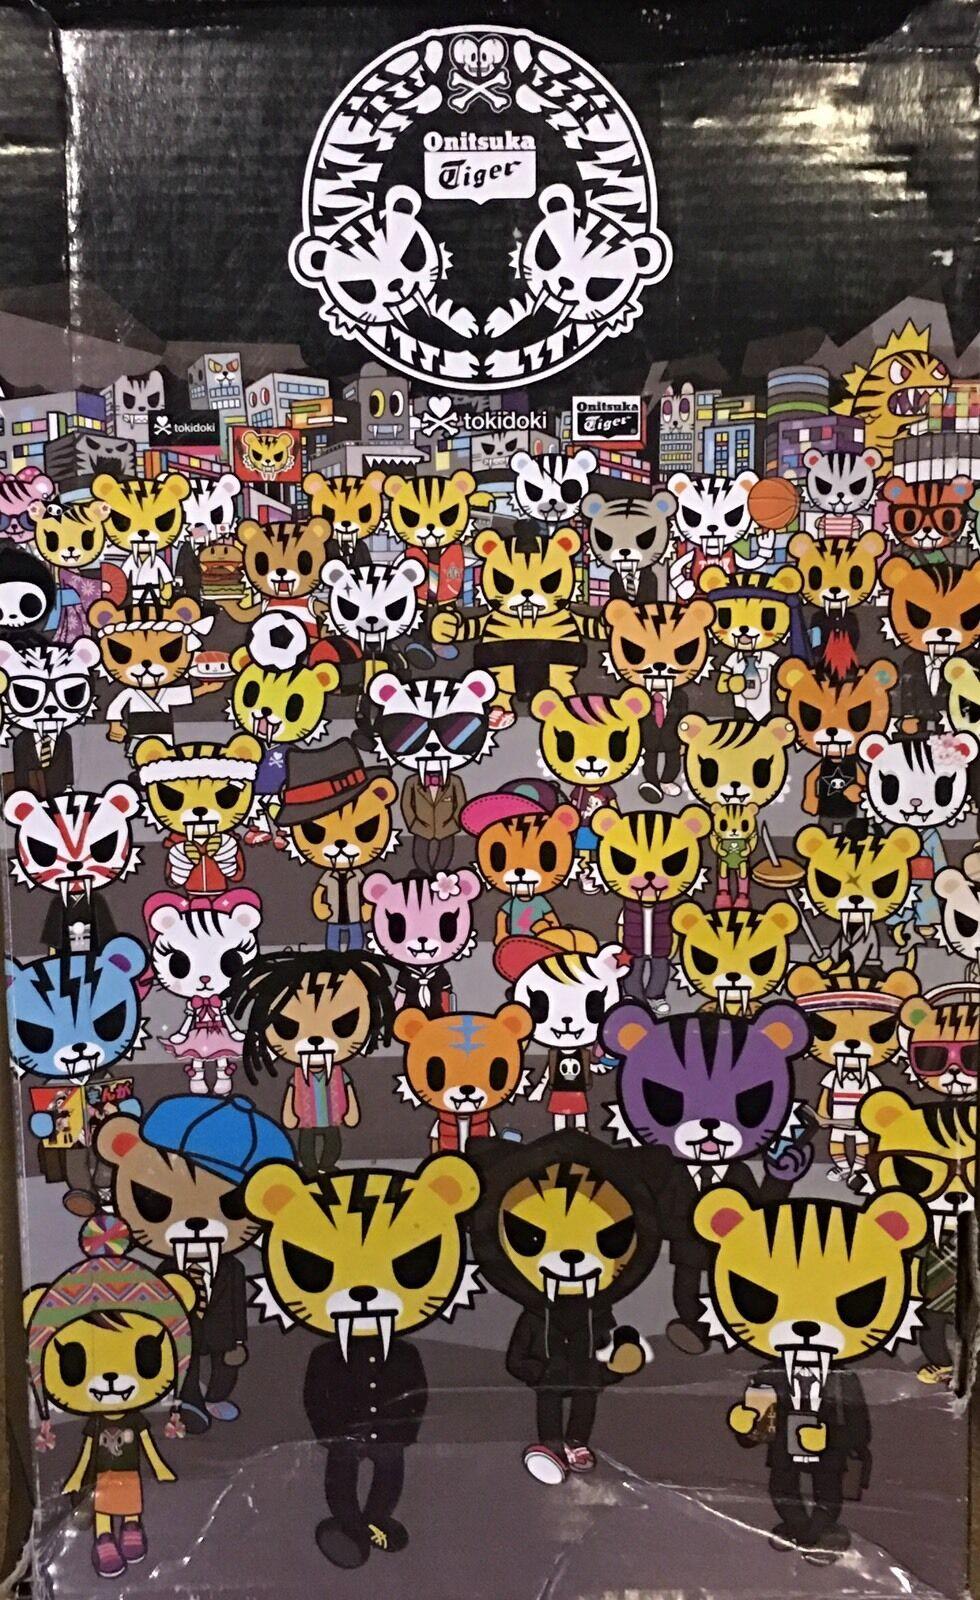 Asics onitsuka tiger, kalifornien, 78 78 78 tokidoki größe 12 stadt laufschuhe turnschuhe ee2806